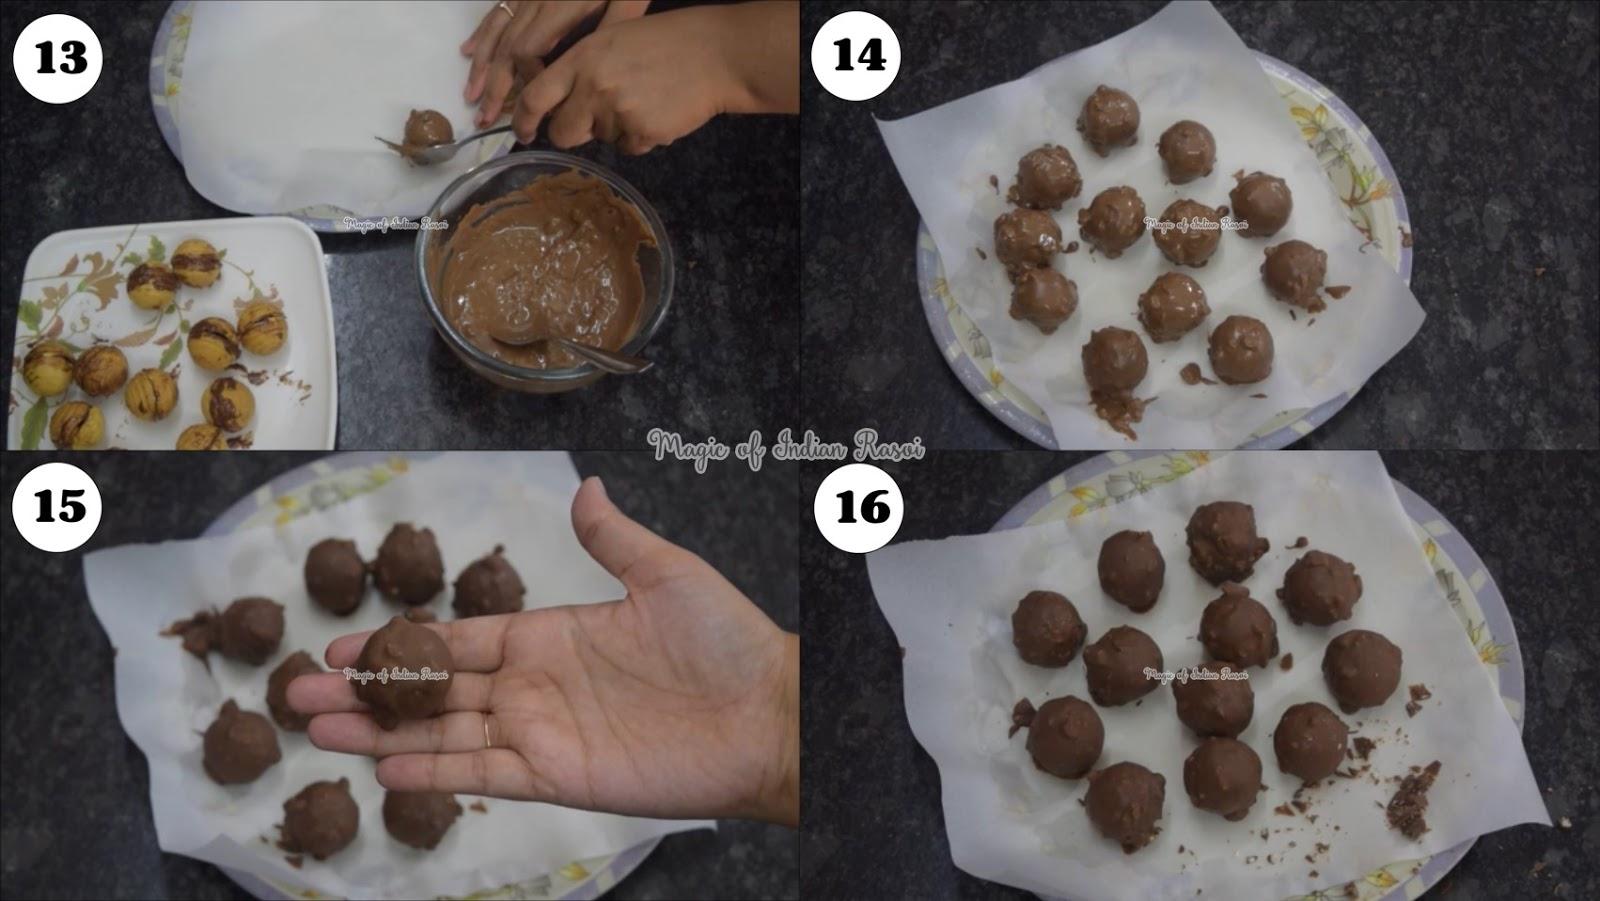 Ferrero Rocher Chocolate Recipe - फरेरो रोचेर चॉकलेट घर पर बनाये - Priya R - Magic of Indian Rasoi